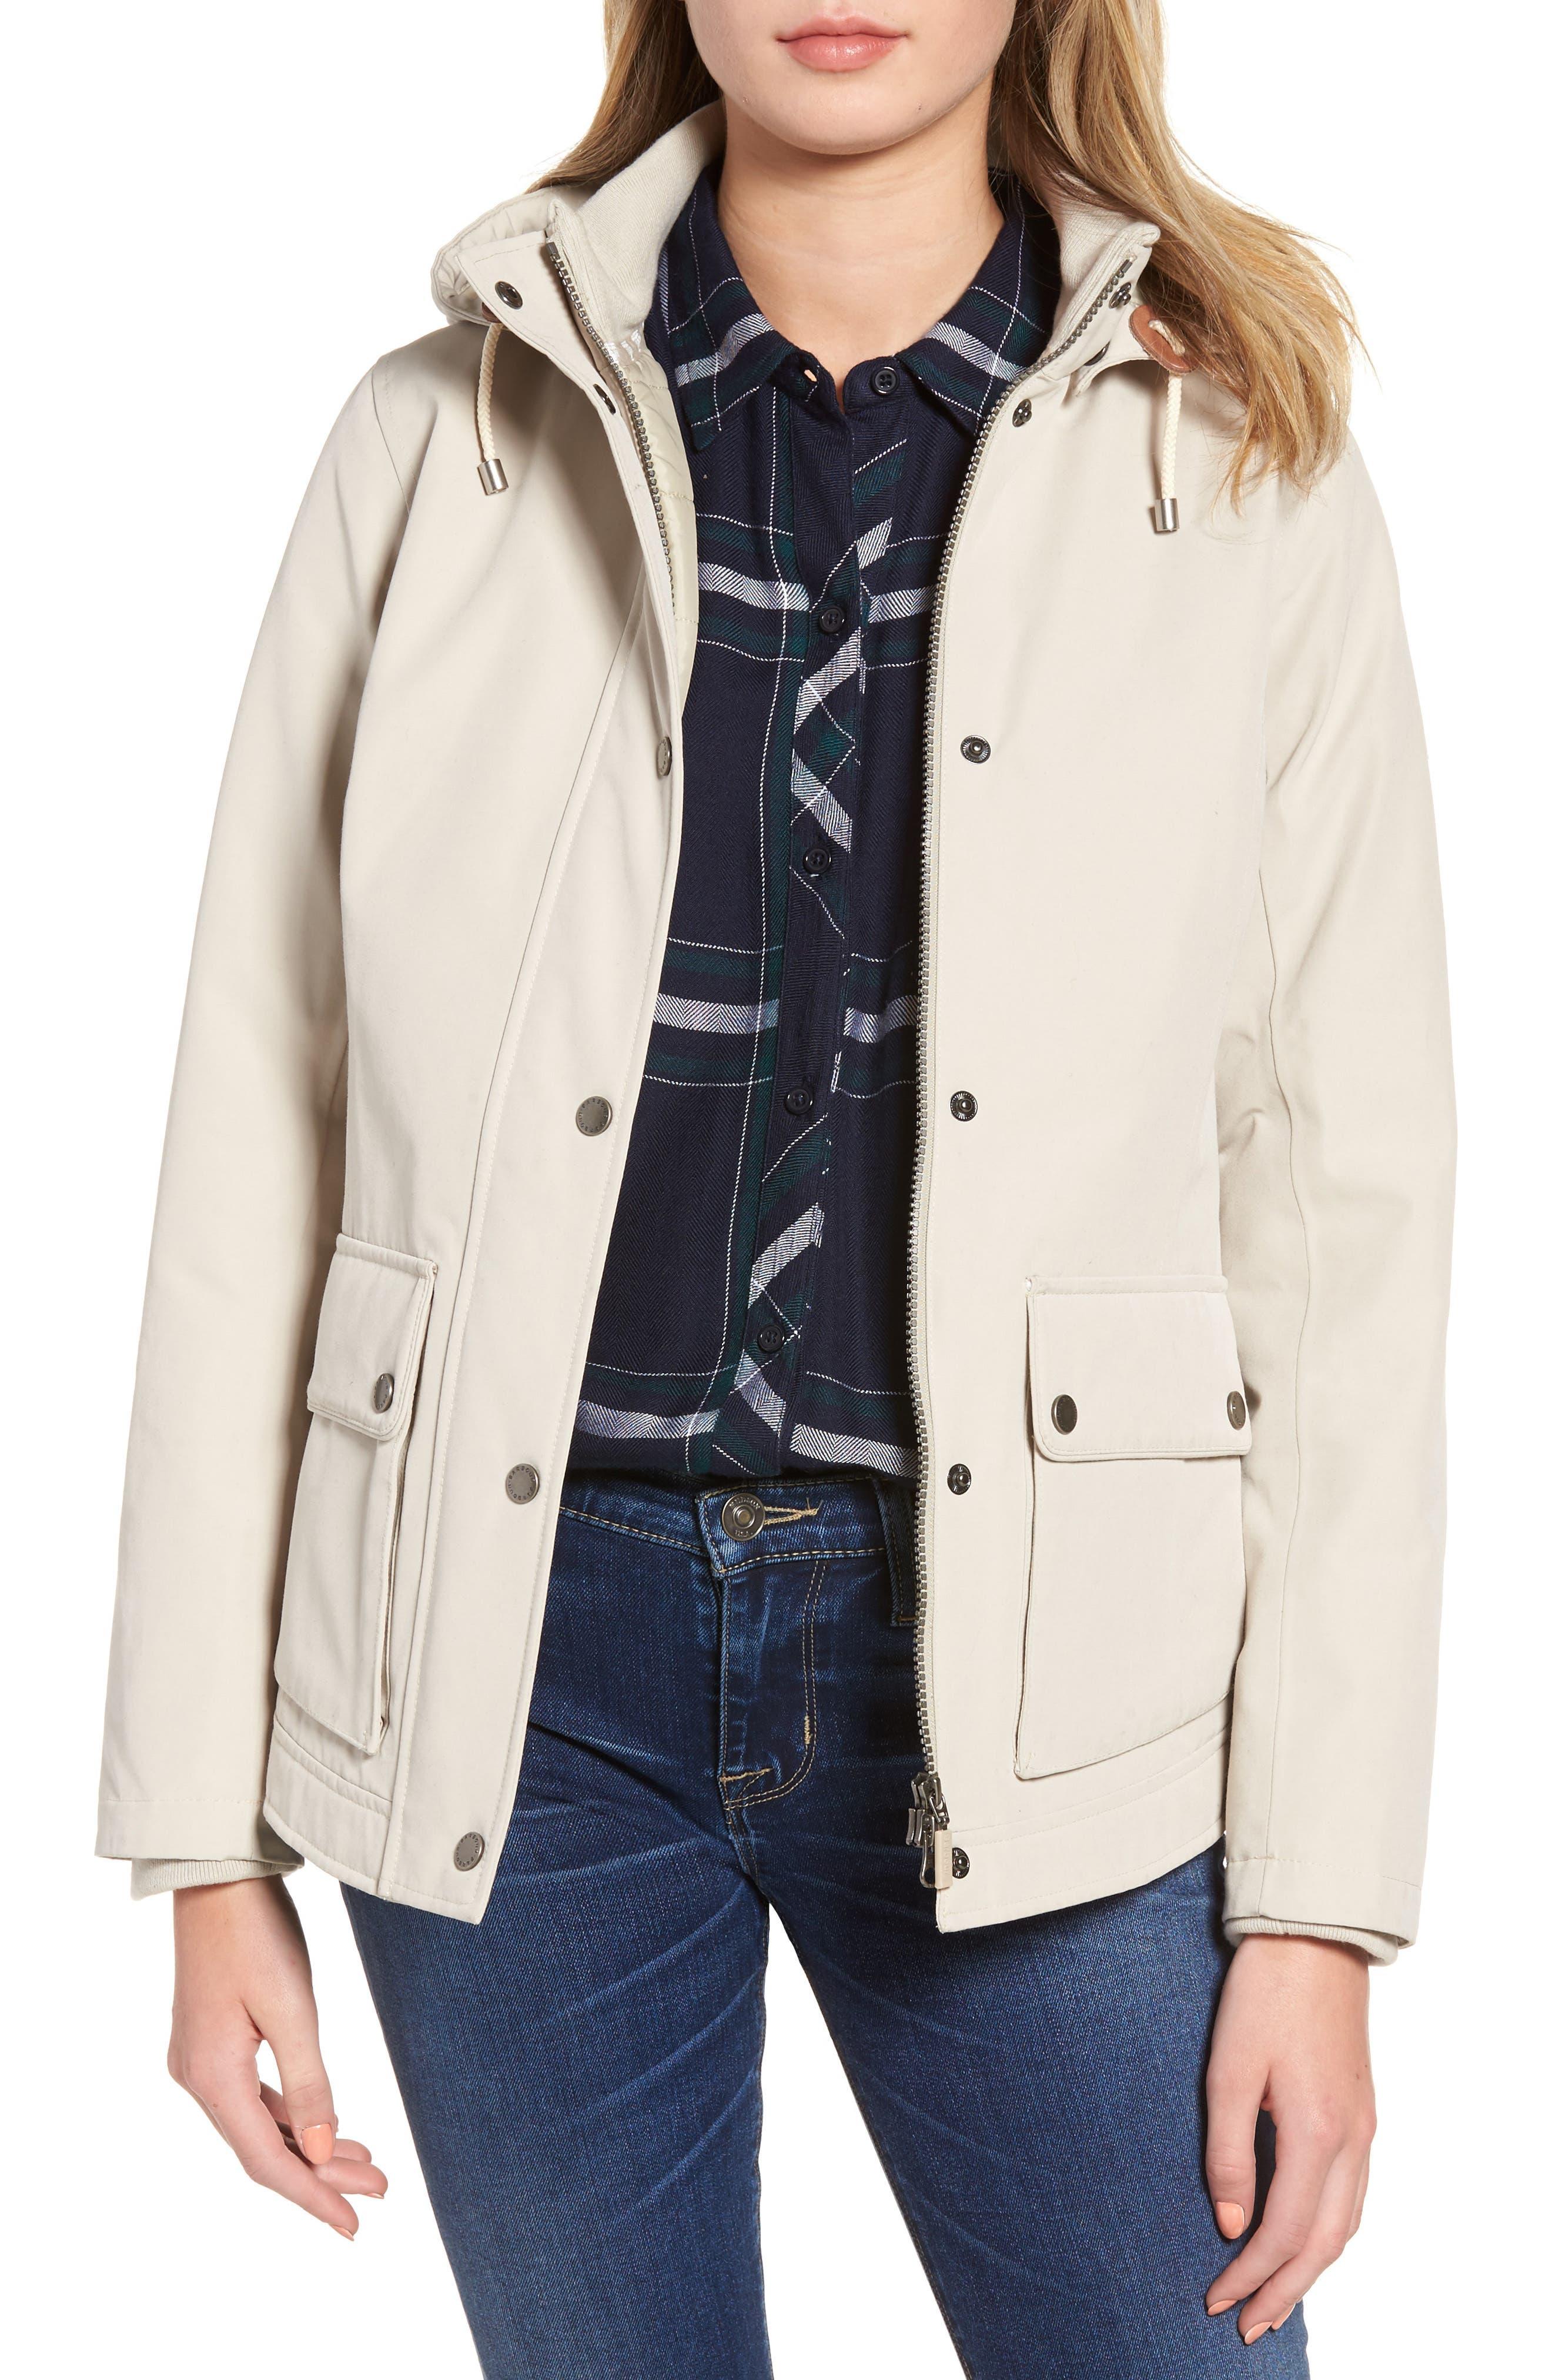 Seaton Hooded Waterproof Jacket,                             Main thumbnail 1, color,                             Mist